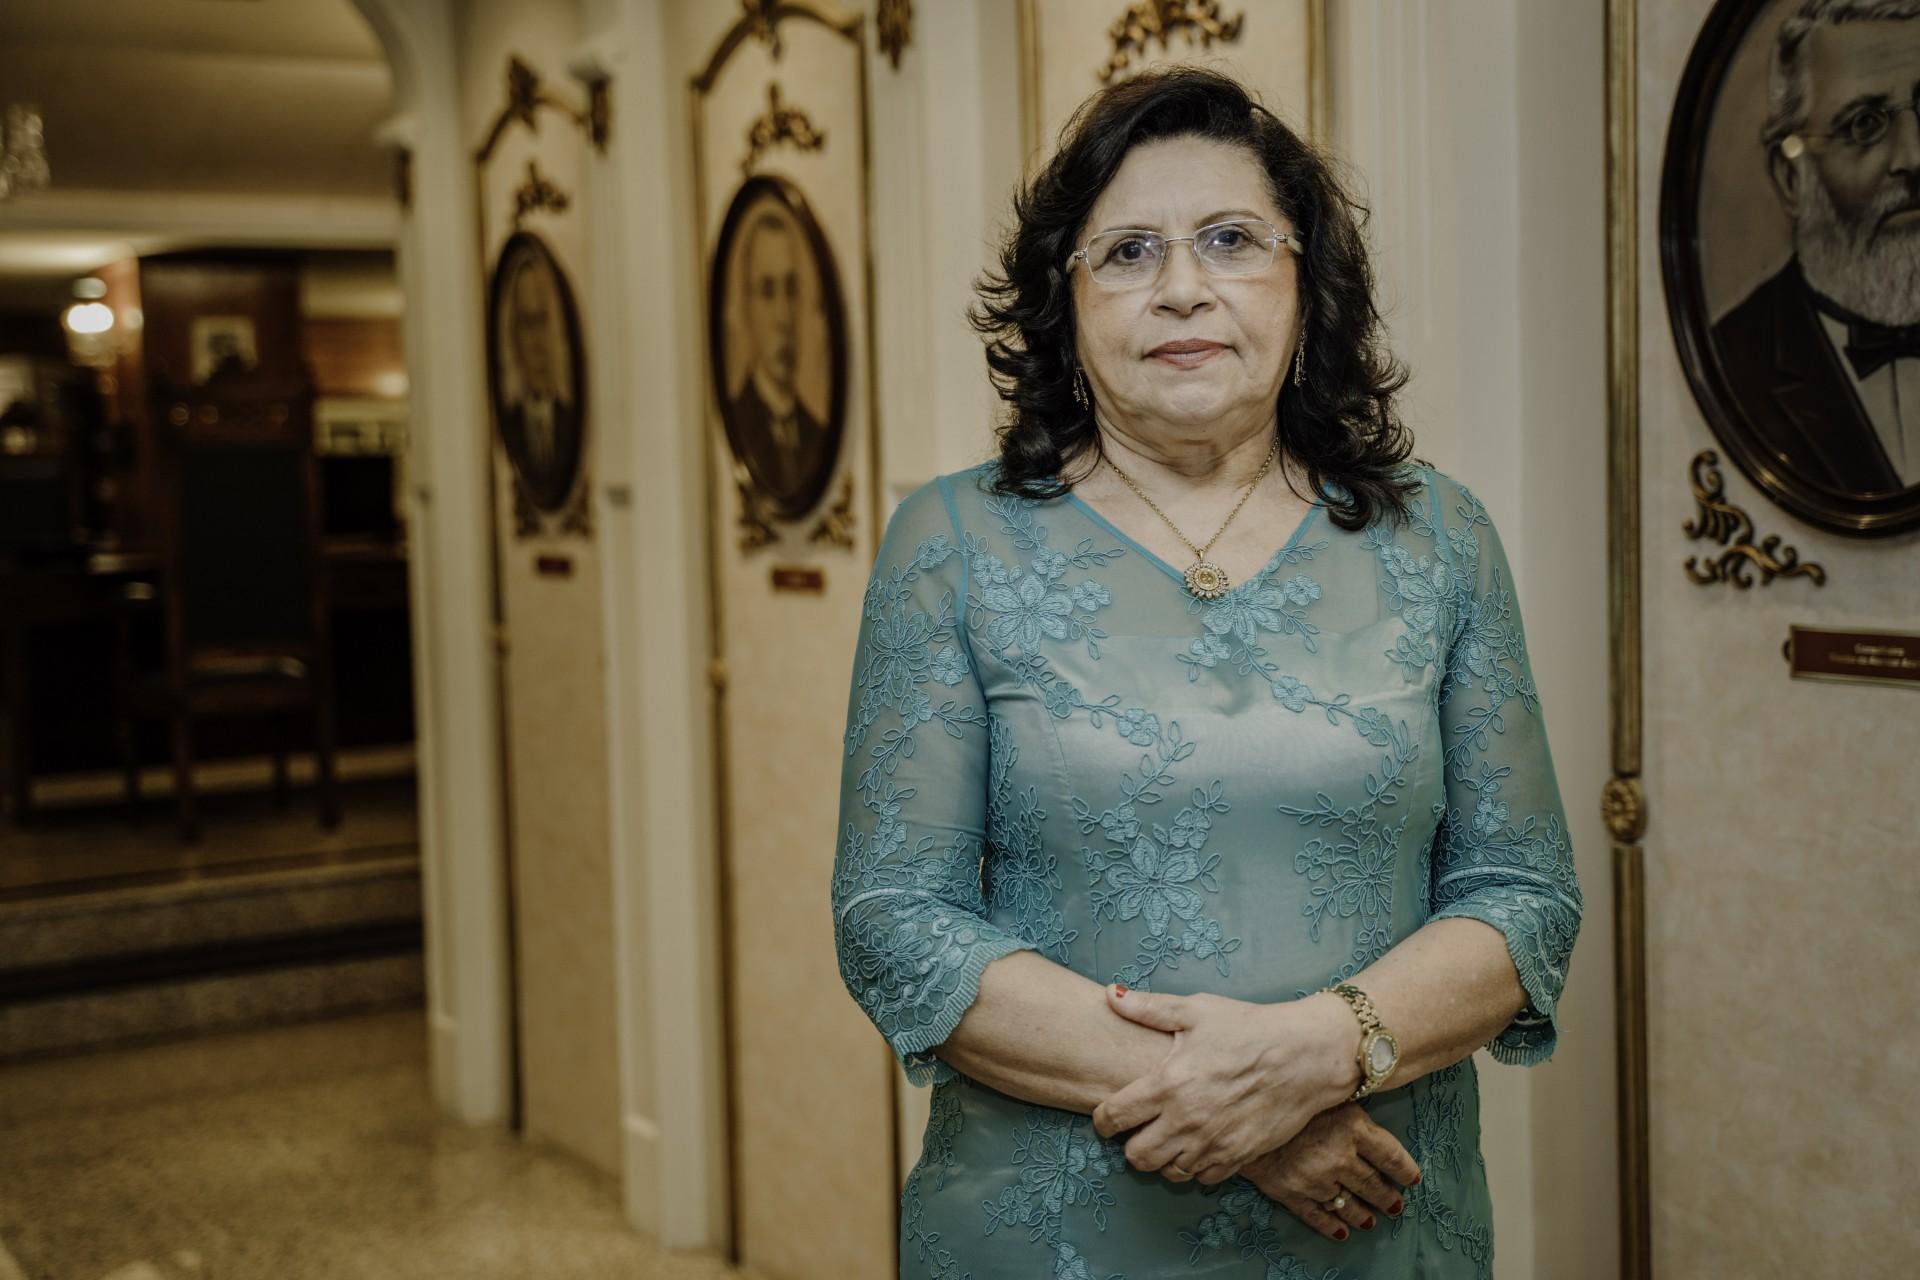 Desembargadora Nailde Pinheiro Nogueira, presidente do Tribunal de Justiça do Ceará